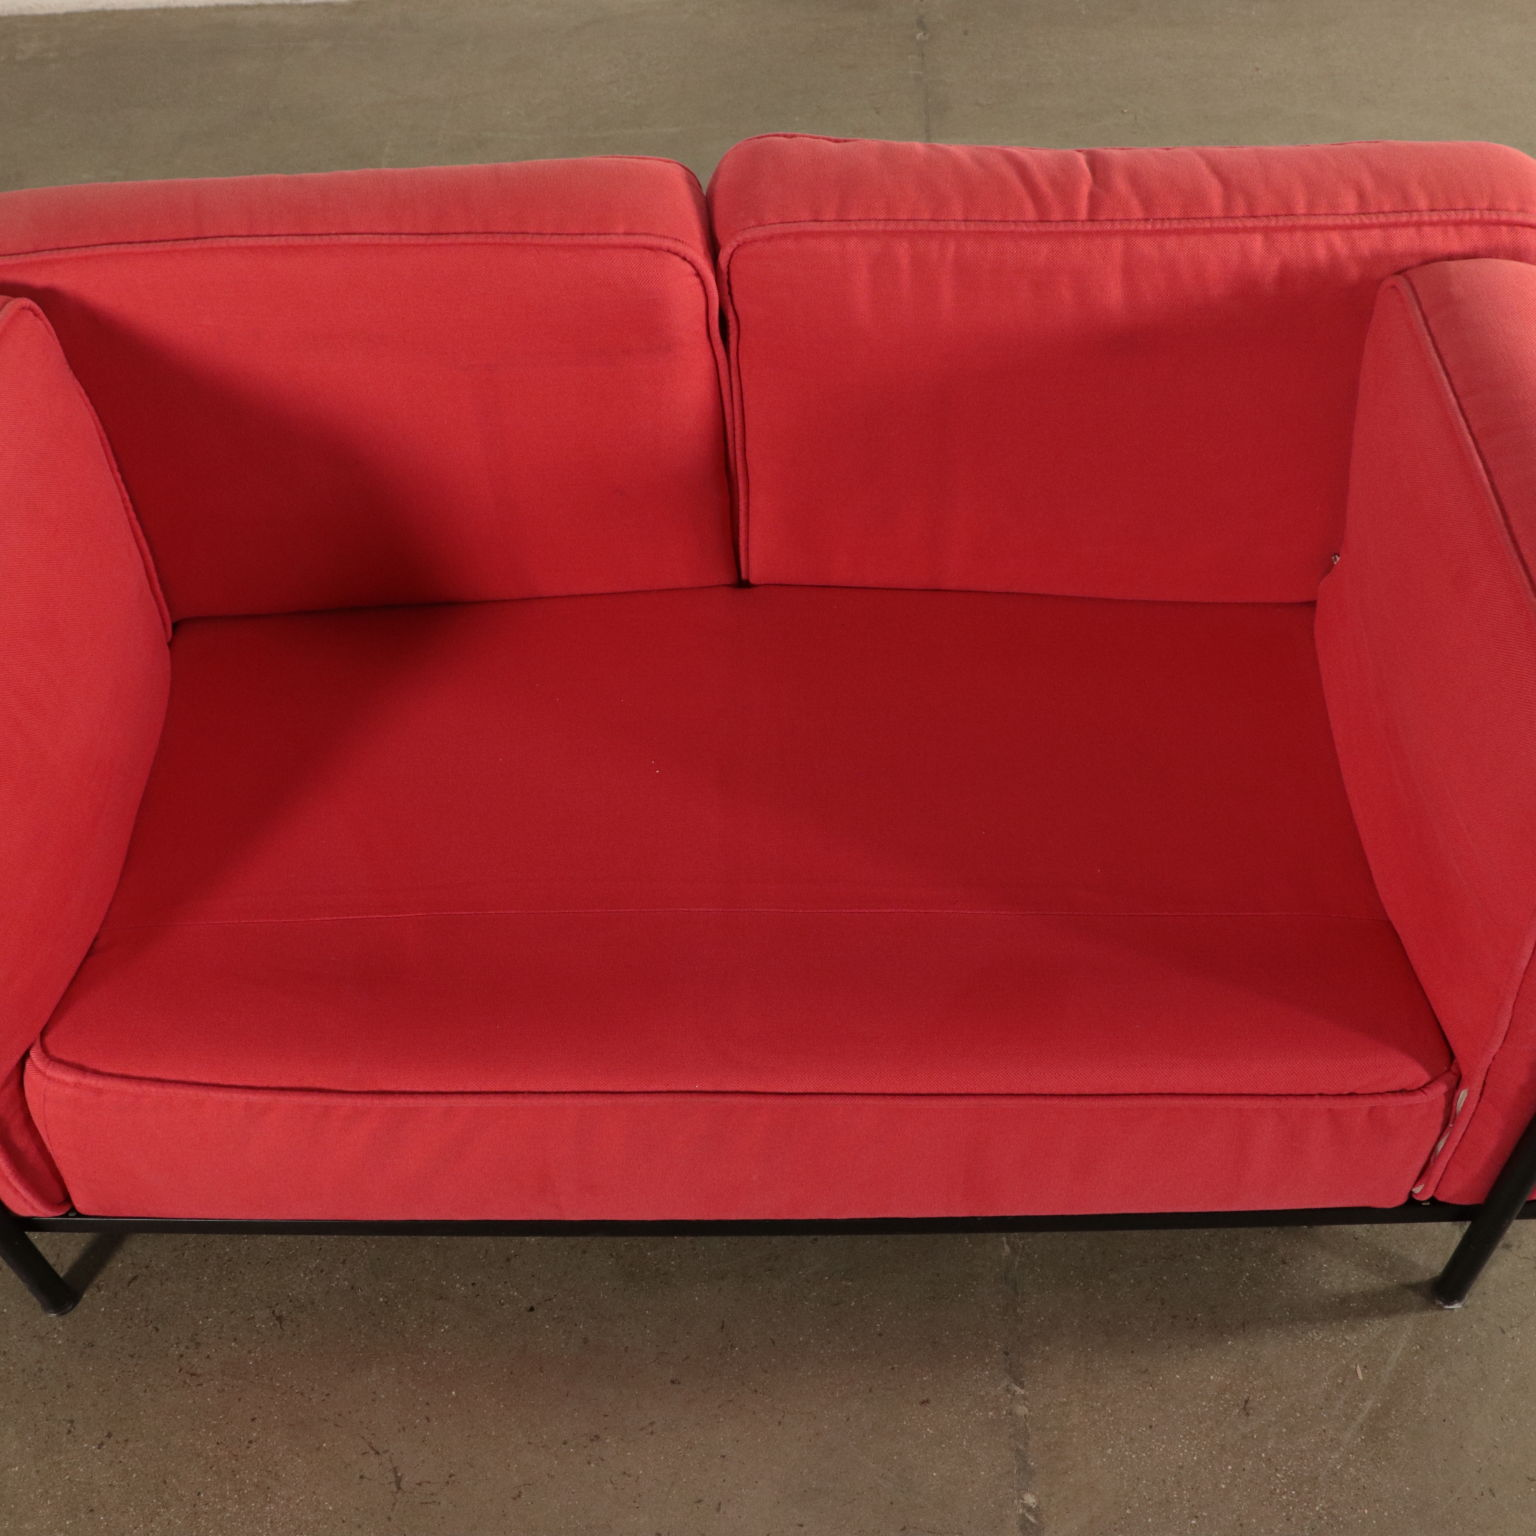 Sofa Le Corbusier - Sofas - Moderne - dimanoinmano.it